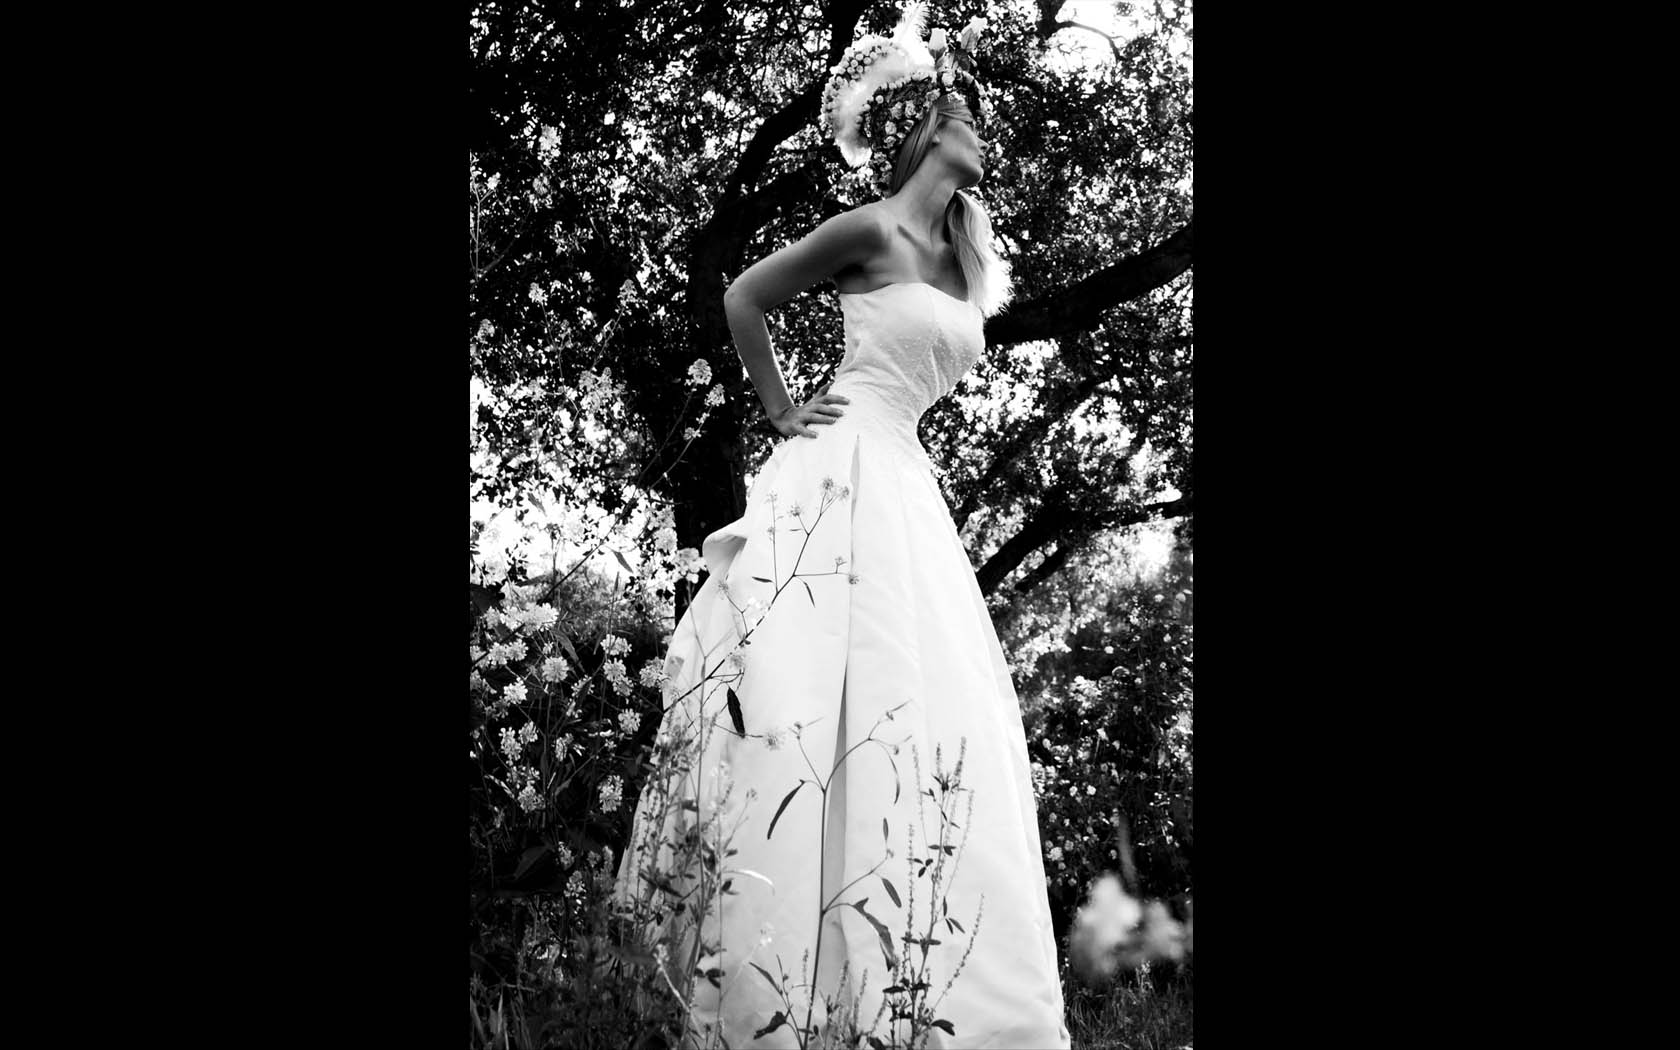 fashion wedding dress by best fashion photographer